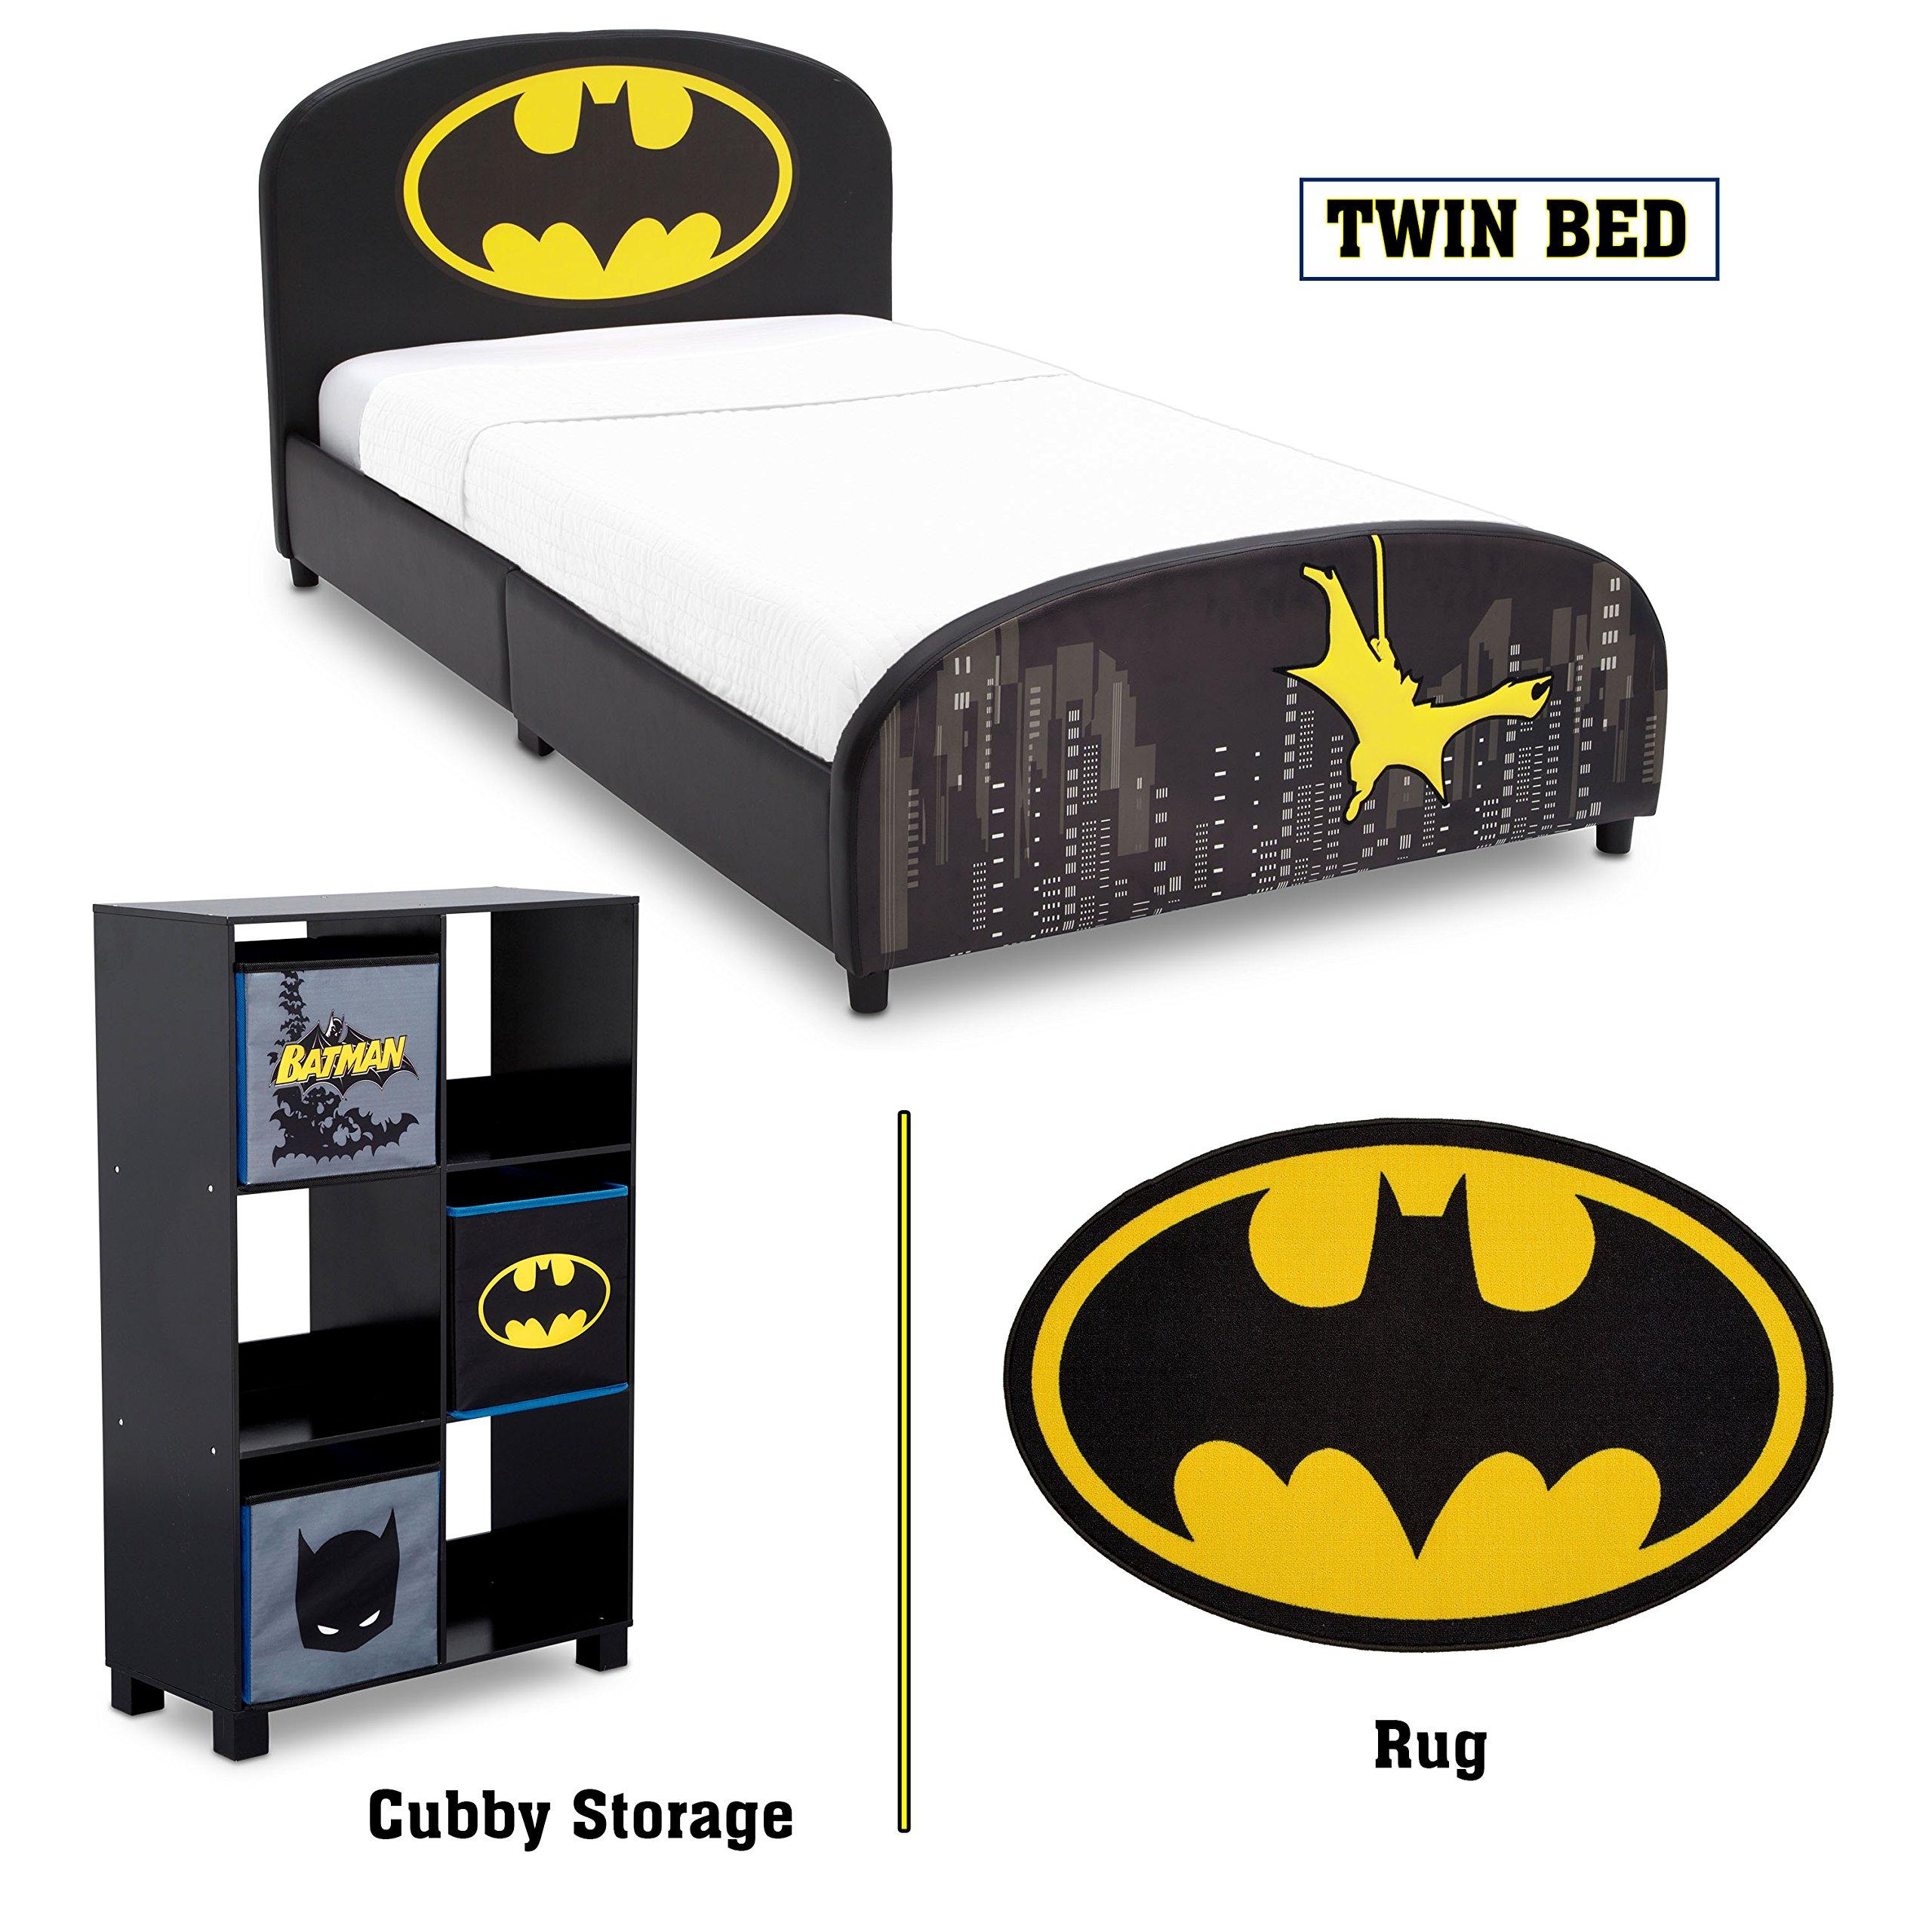 Delta Children - Batman Twin Furniture Set, 3-Piece by DC Comics (Batman Upholstered Twin Bed   Storage Unit with 6 Cubby's and Batman Bins   Batman Area Rug)